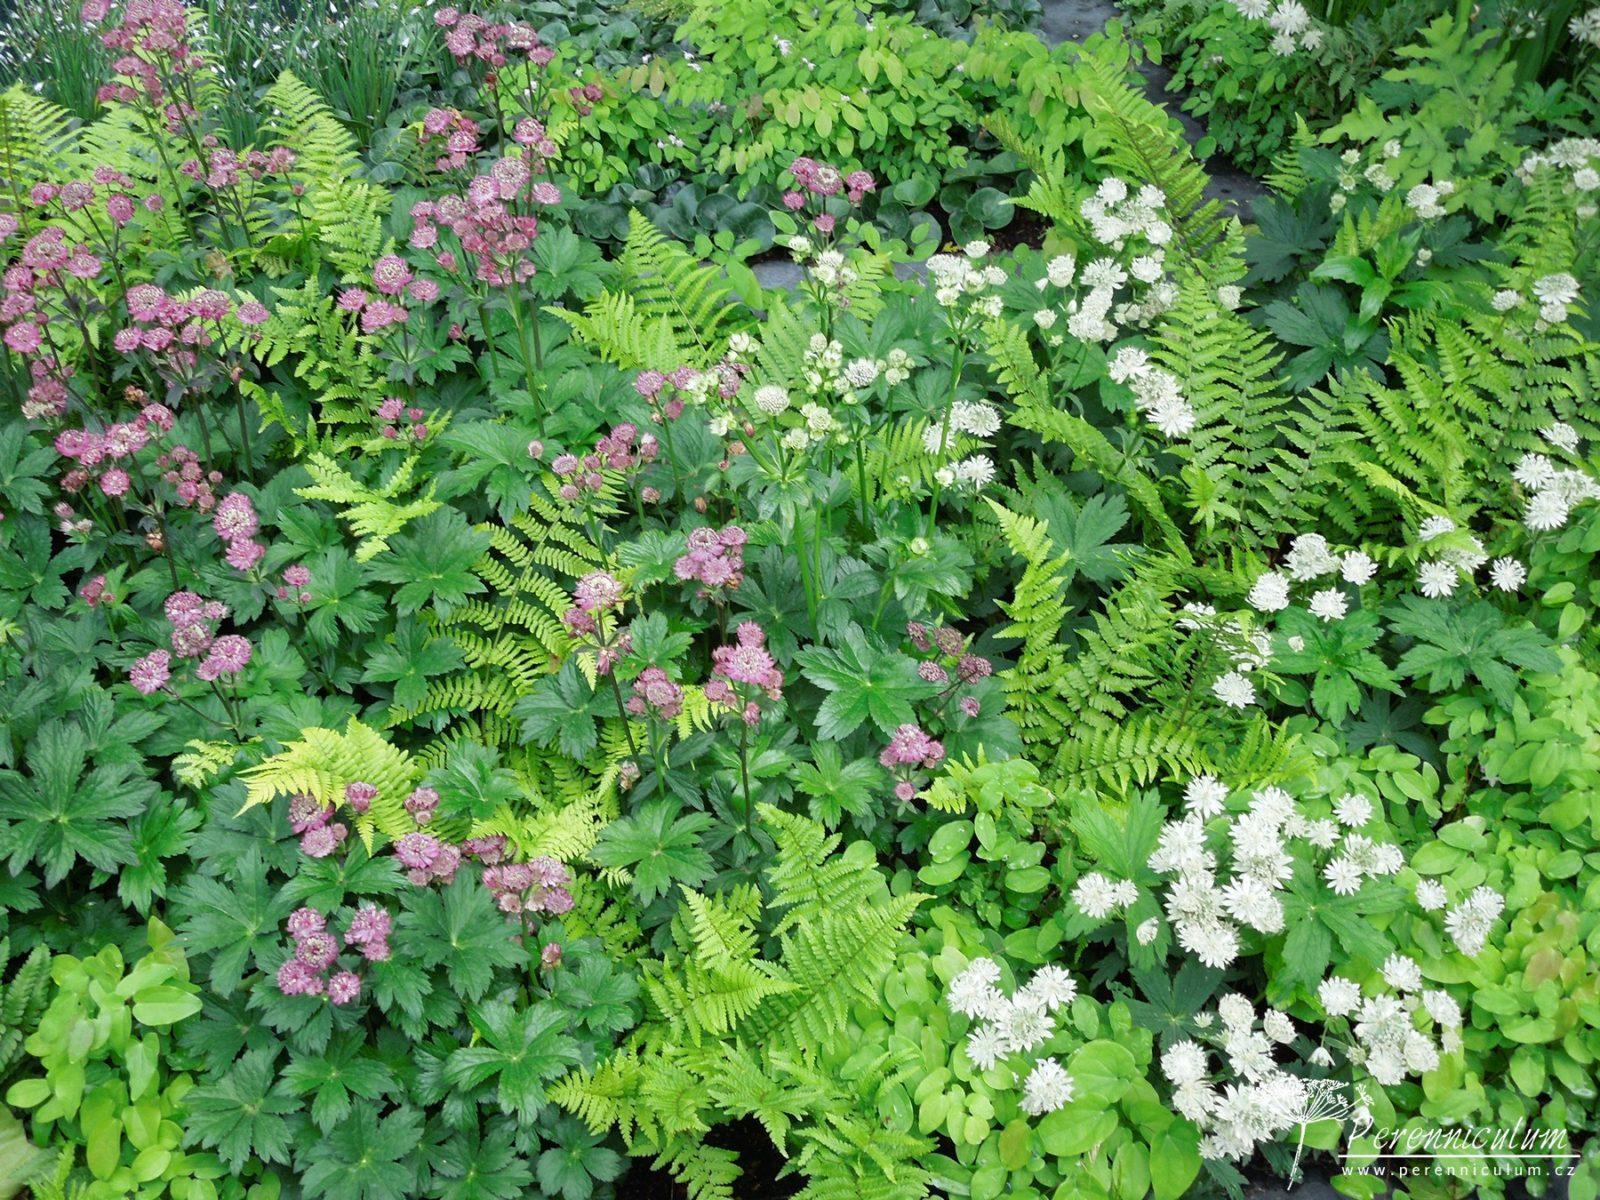 Polostinná tapiserie textur kapradin, listů a květů jarmanek.